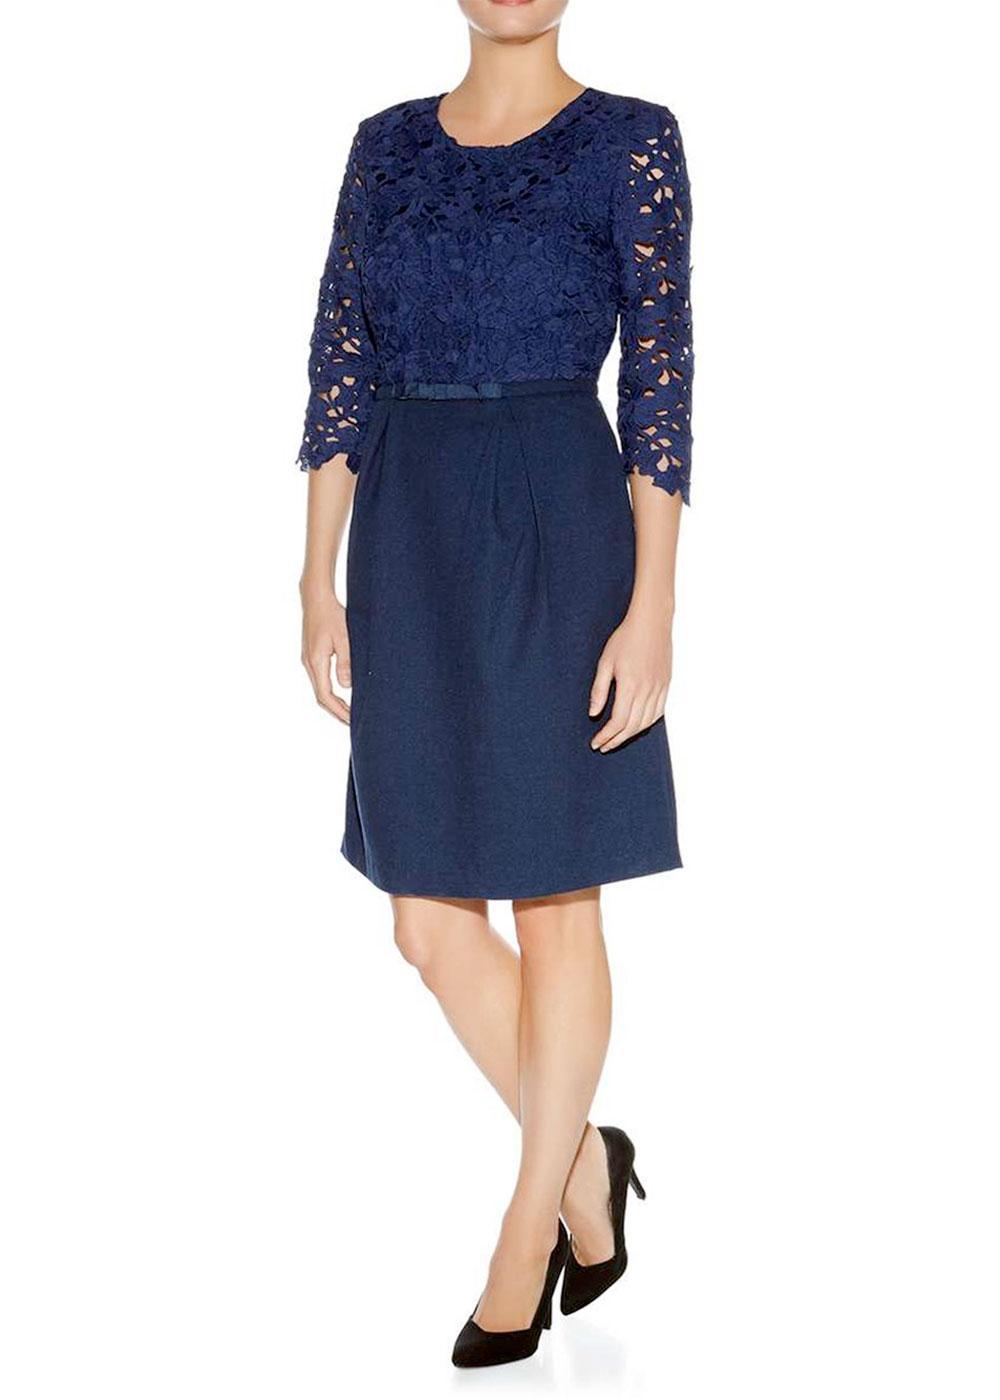 Fleur DARLING Retro 60s Lace Cutaway Dress (N)